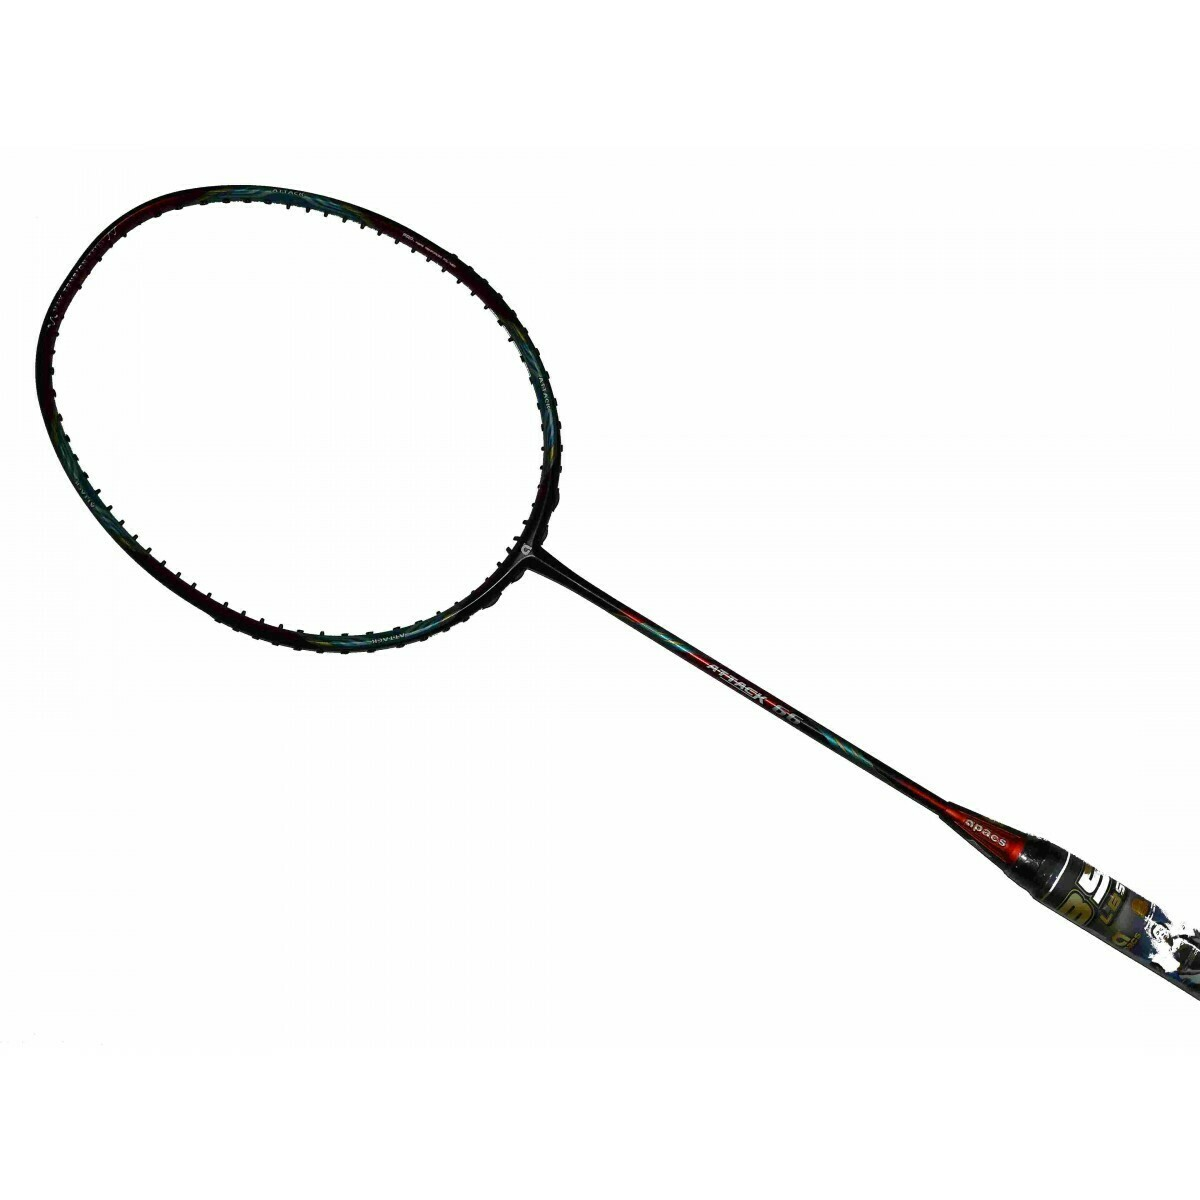 Apacs Attack 66 Red Badminton Racquet